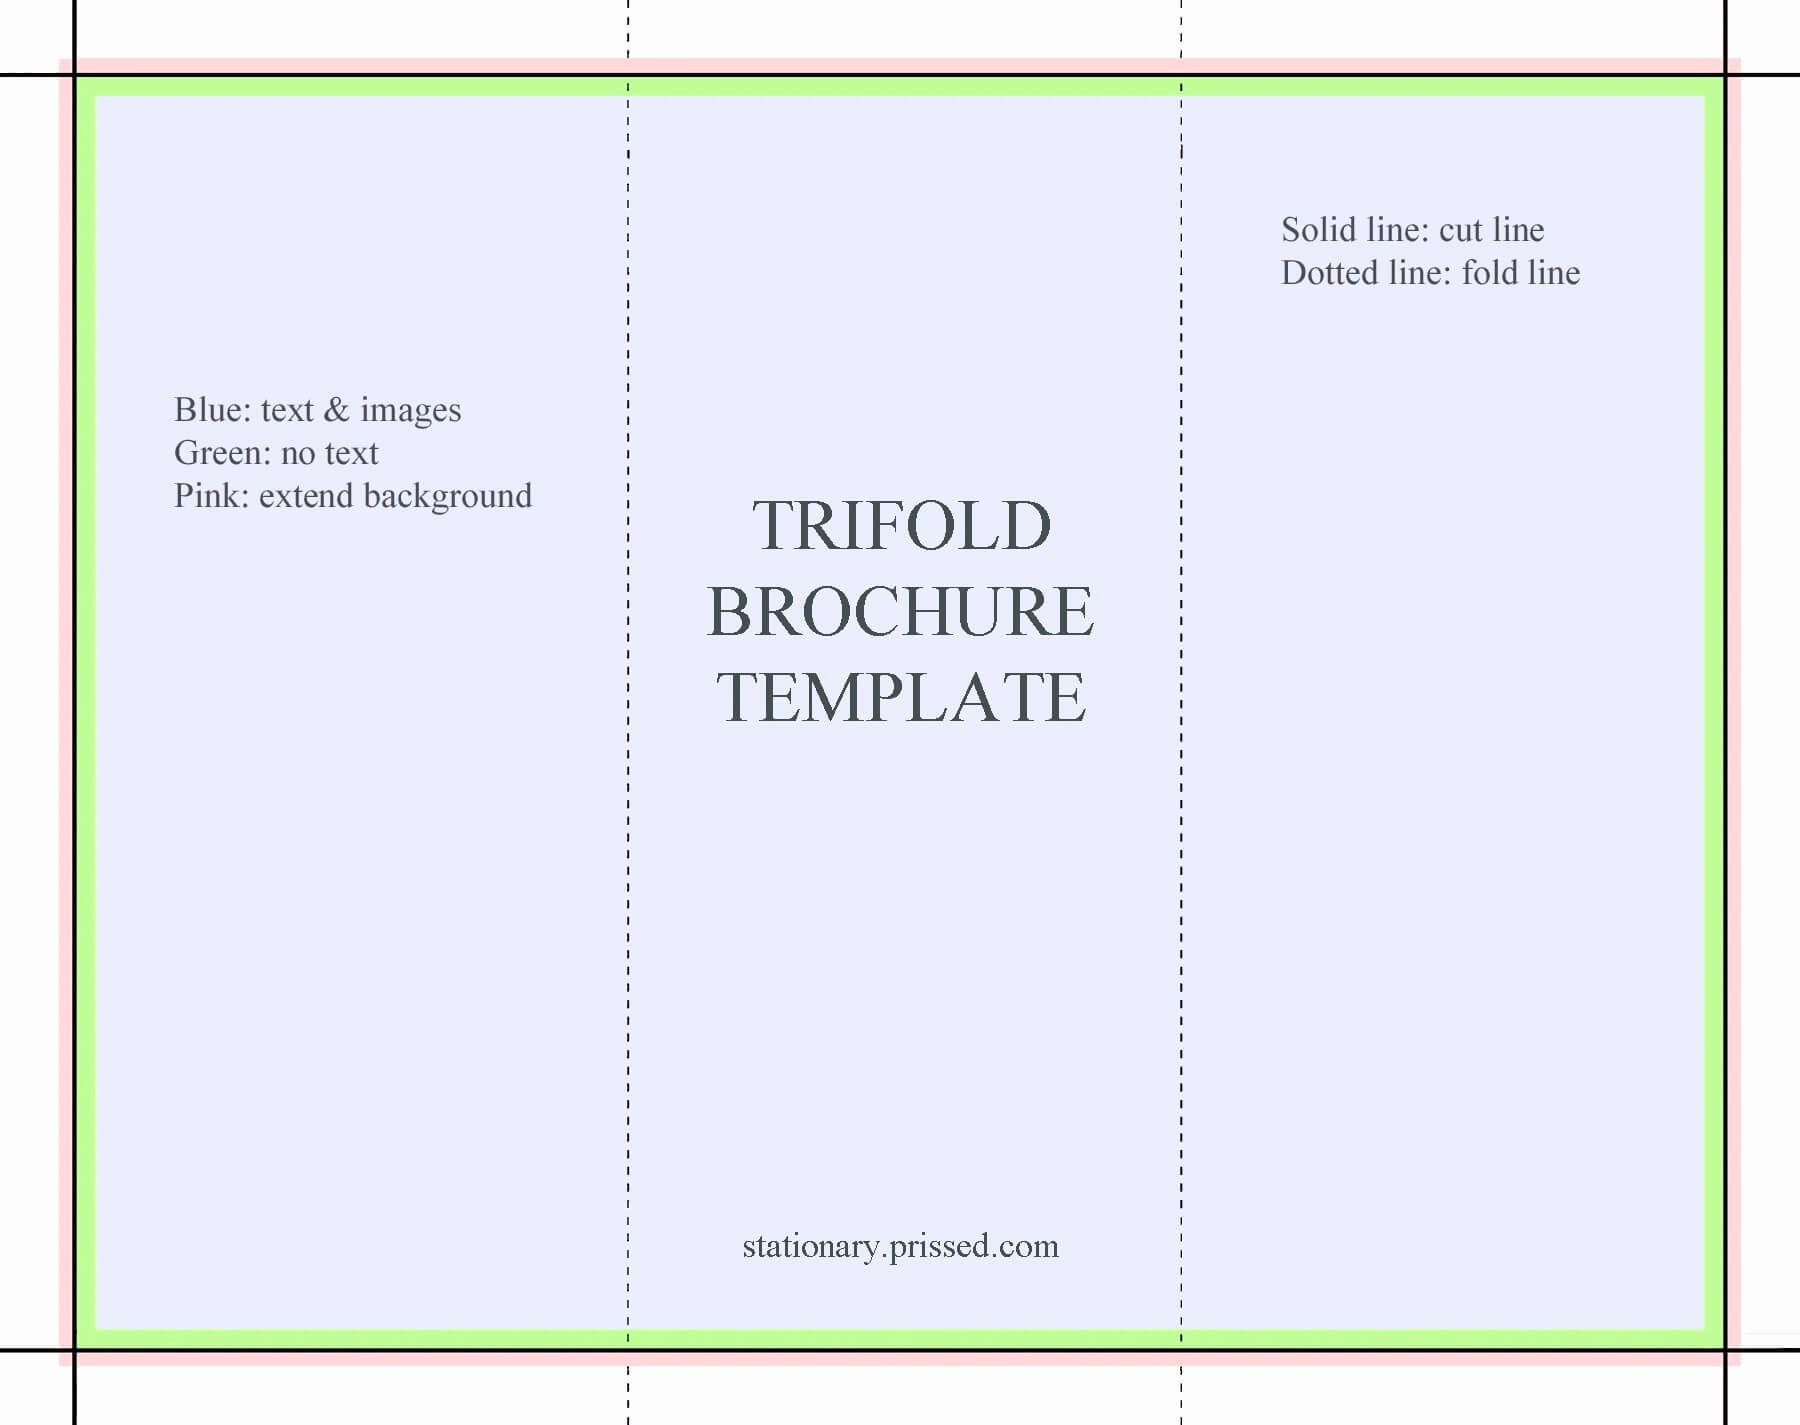 Blank Brochure Template Google Docs – Locksmithcovington In Science Brochure Template Google Docs